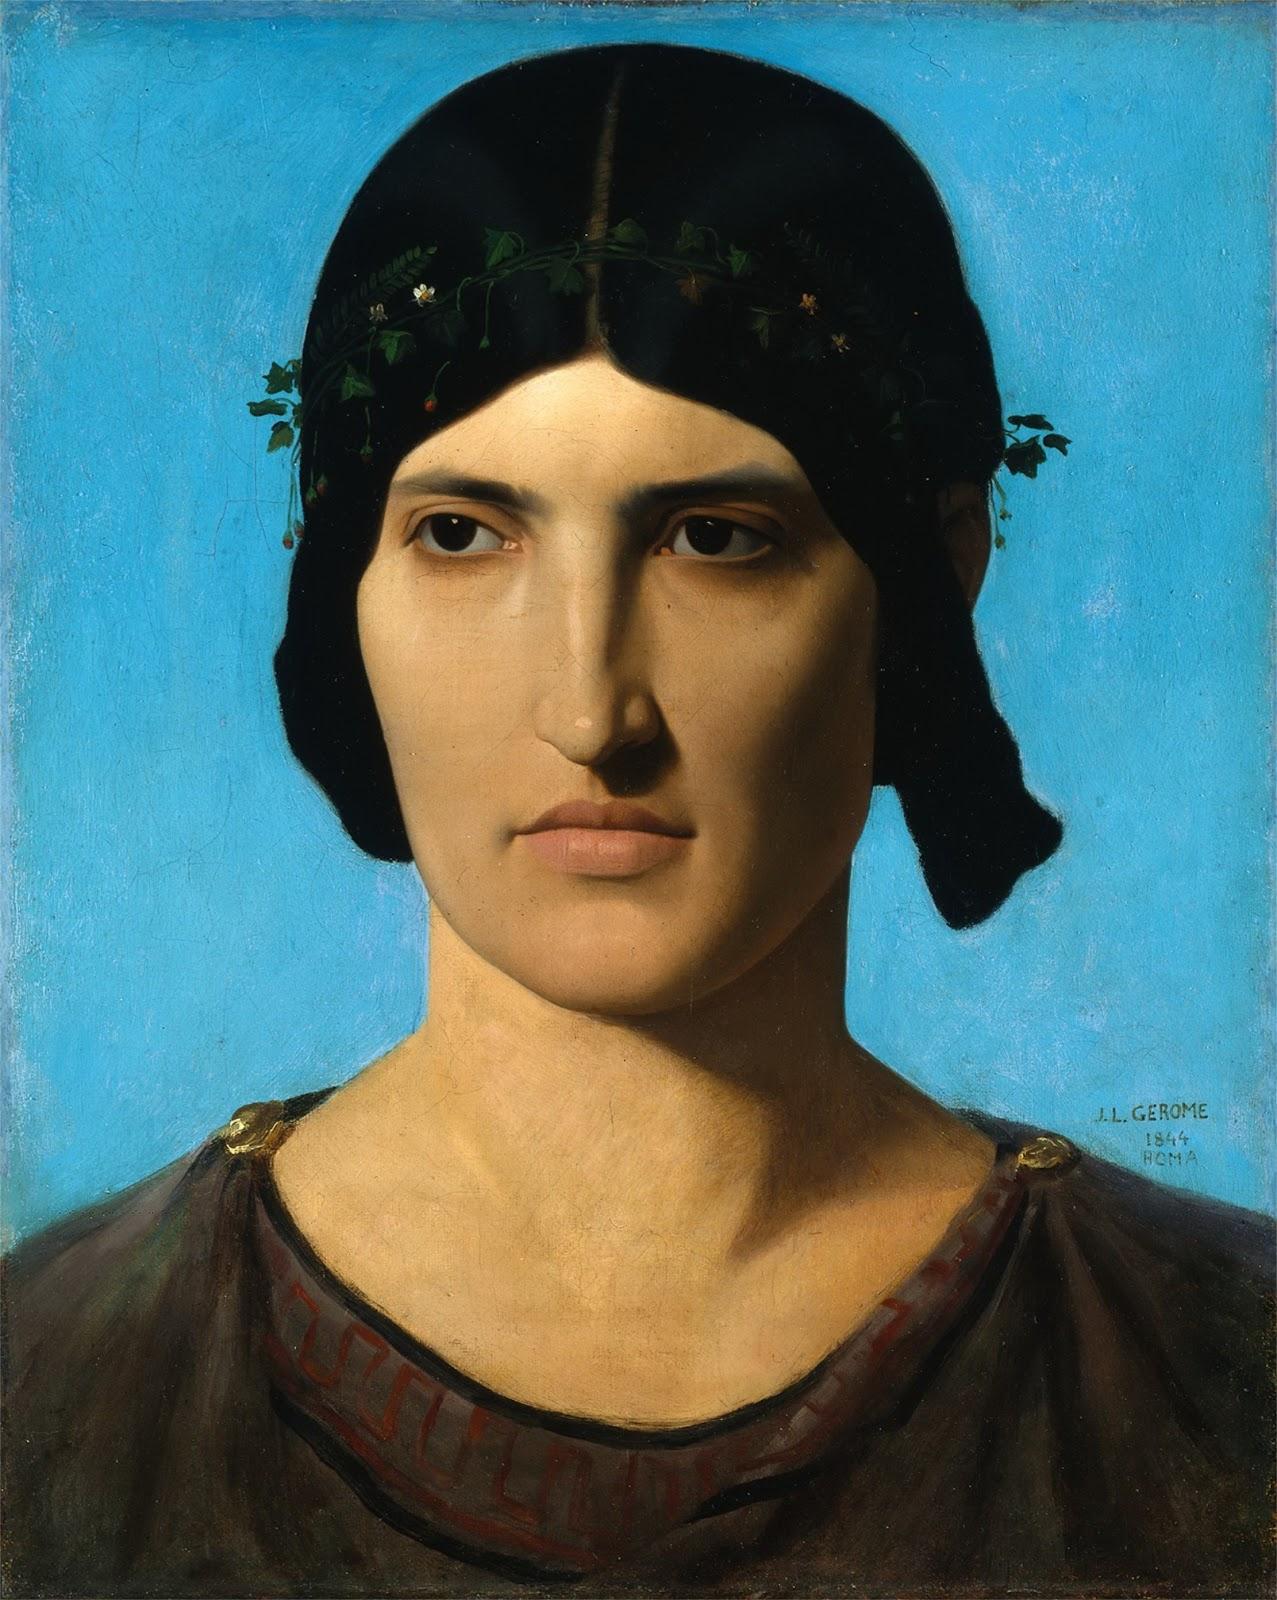 http://2.bp.blogspot.com/-n5YkD_c3BCE/UQE0xKPbTGI/AAAAAAAAchA/E6cT-KnoFWU/s1600/Portrait+of+a+Roman+woman.jpg